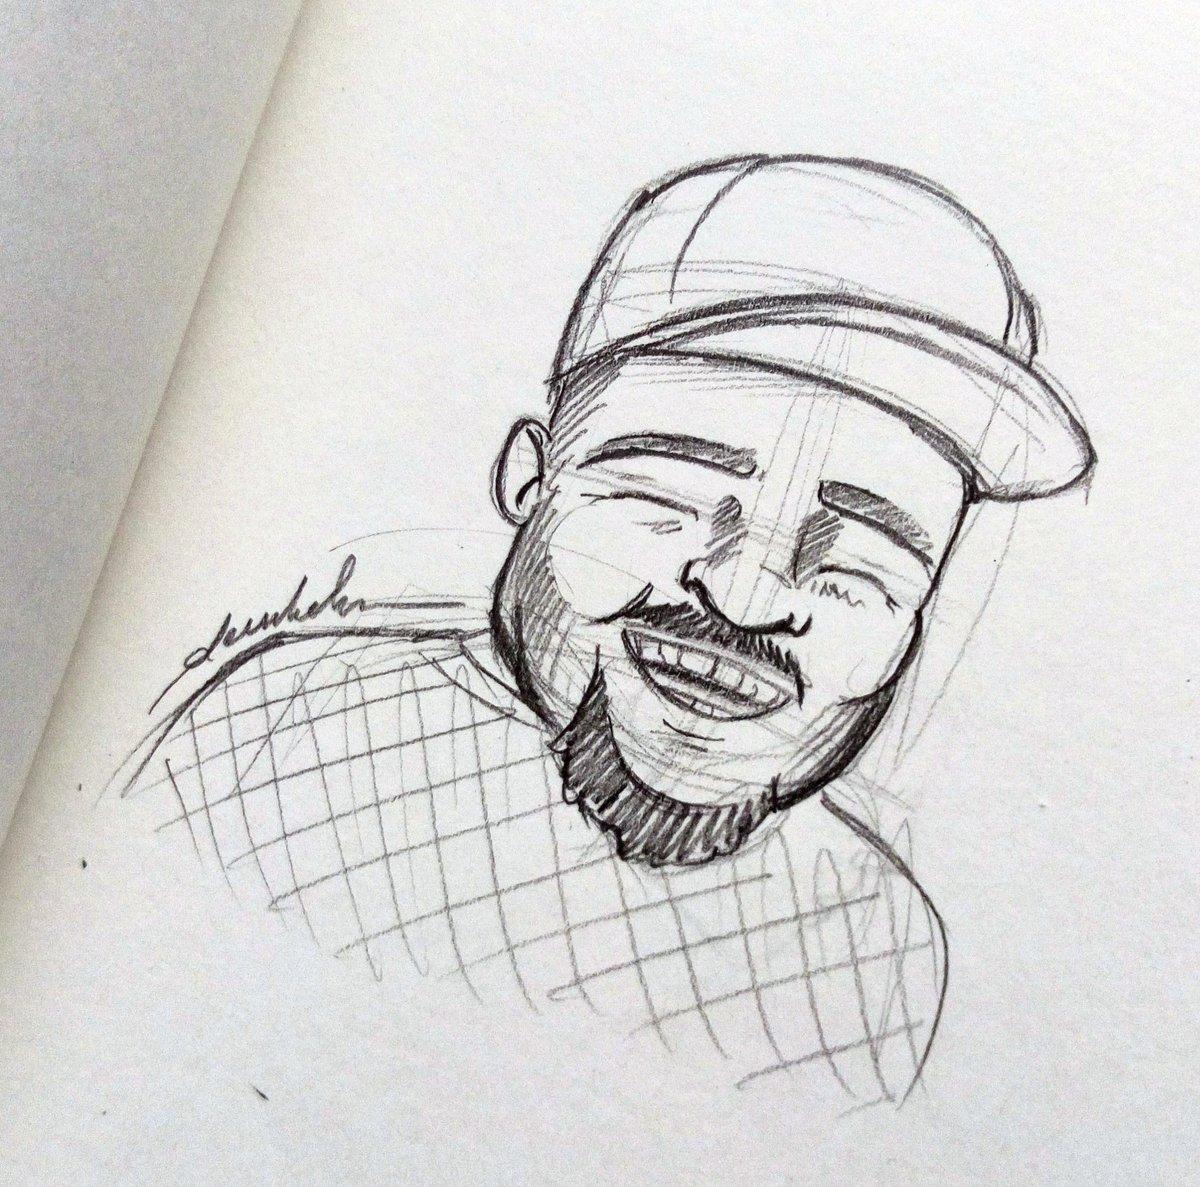 Just smile #dailyart #dailyillustration #portrait #justsmile #smile #face #character https://t.co/OgzMt3IIEj